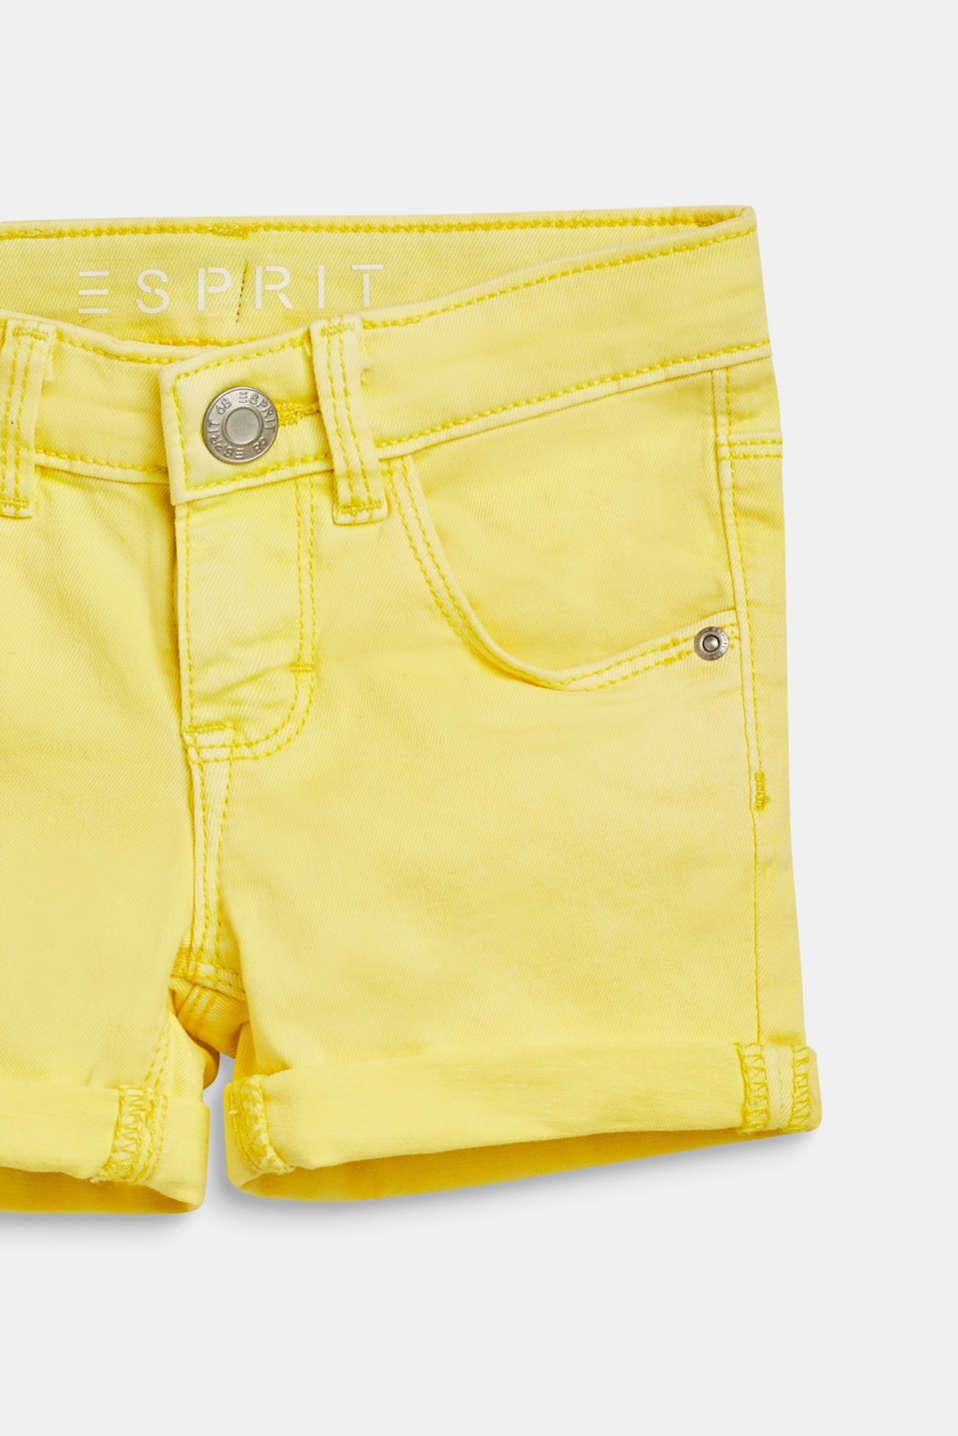 Coloured denim shorts with an adjustable waistband, LEMON DROP, detail image number 2